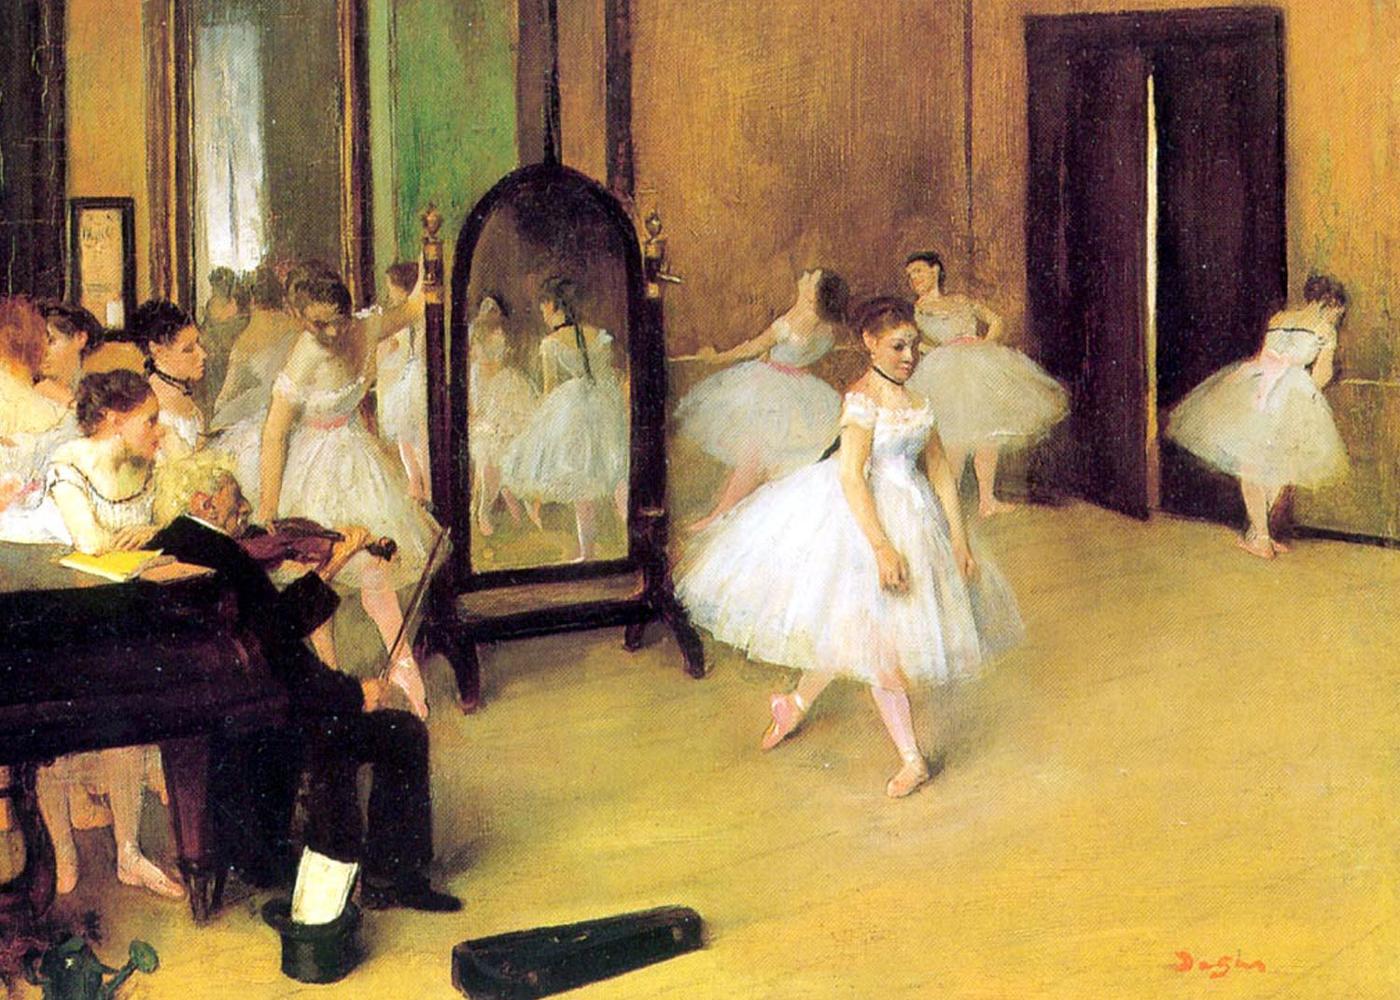 Clase de danza, Edgar Degas, 1871. Metropolitan Museum, Nueva York